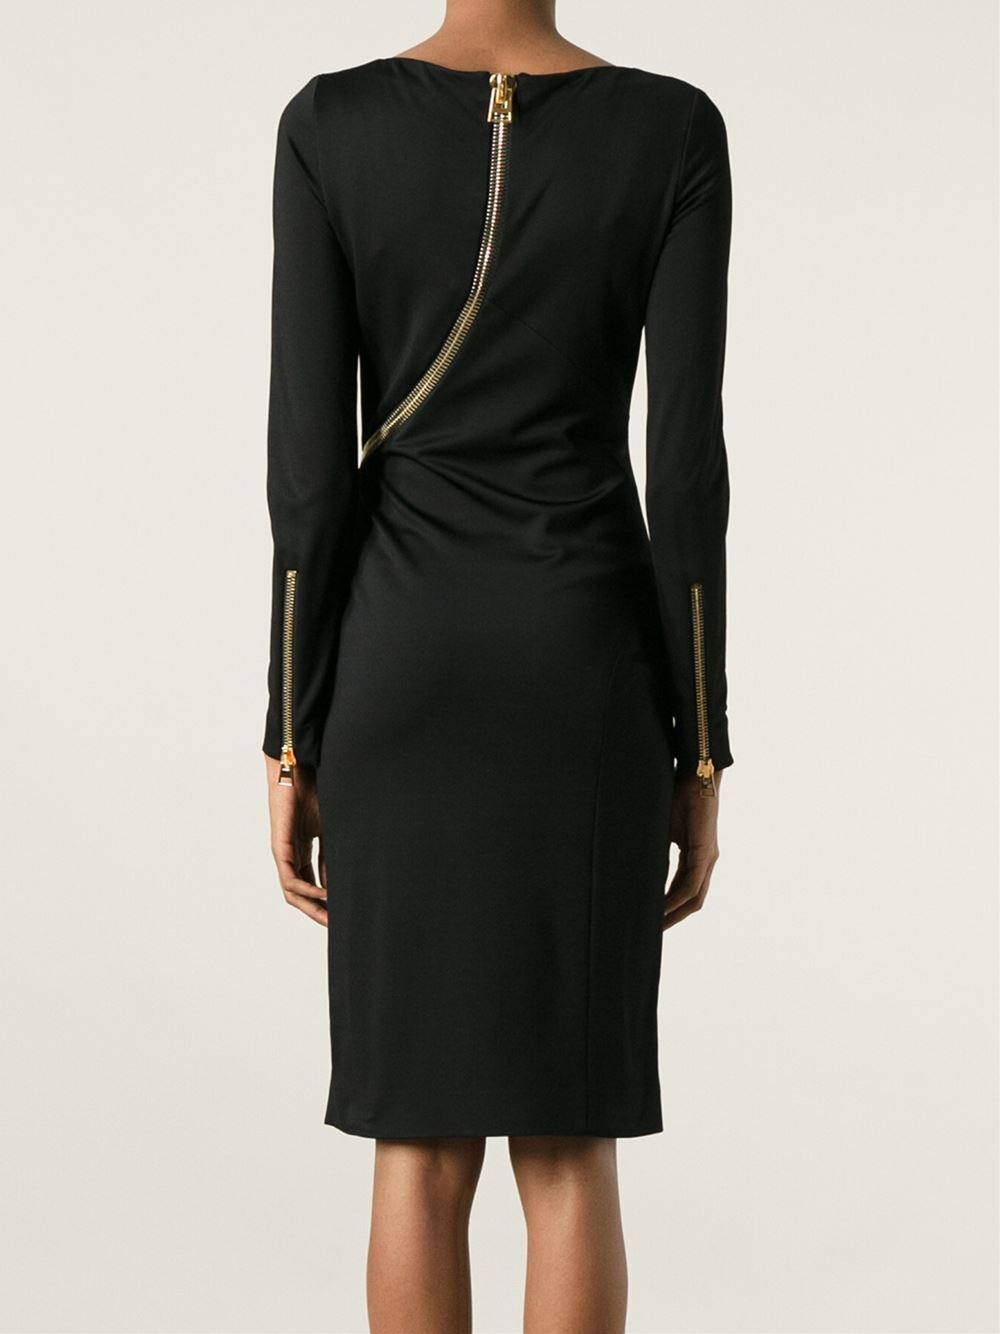 Tom Ford Zip Detail Pencil Dress In Black Lyst